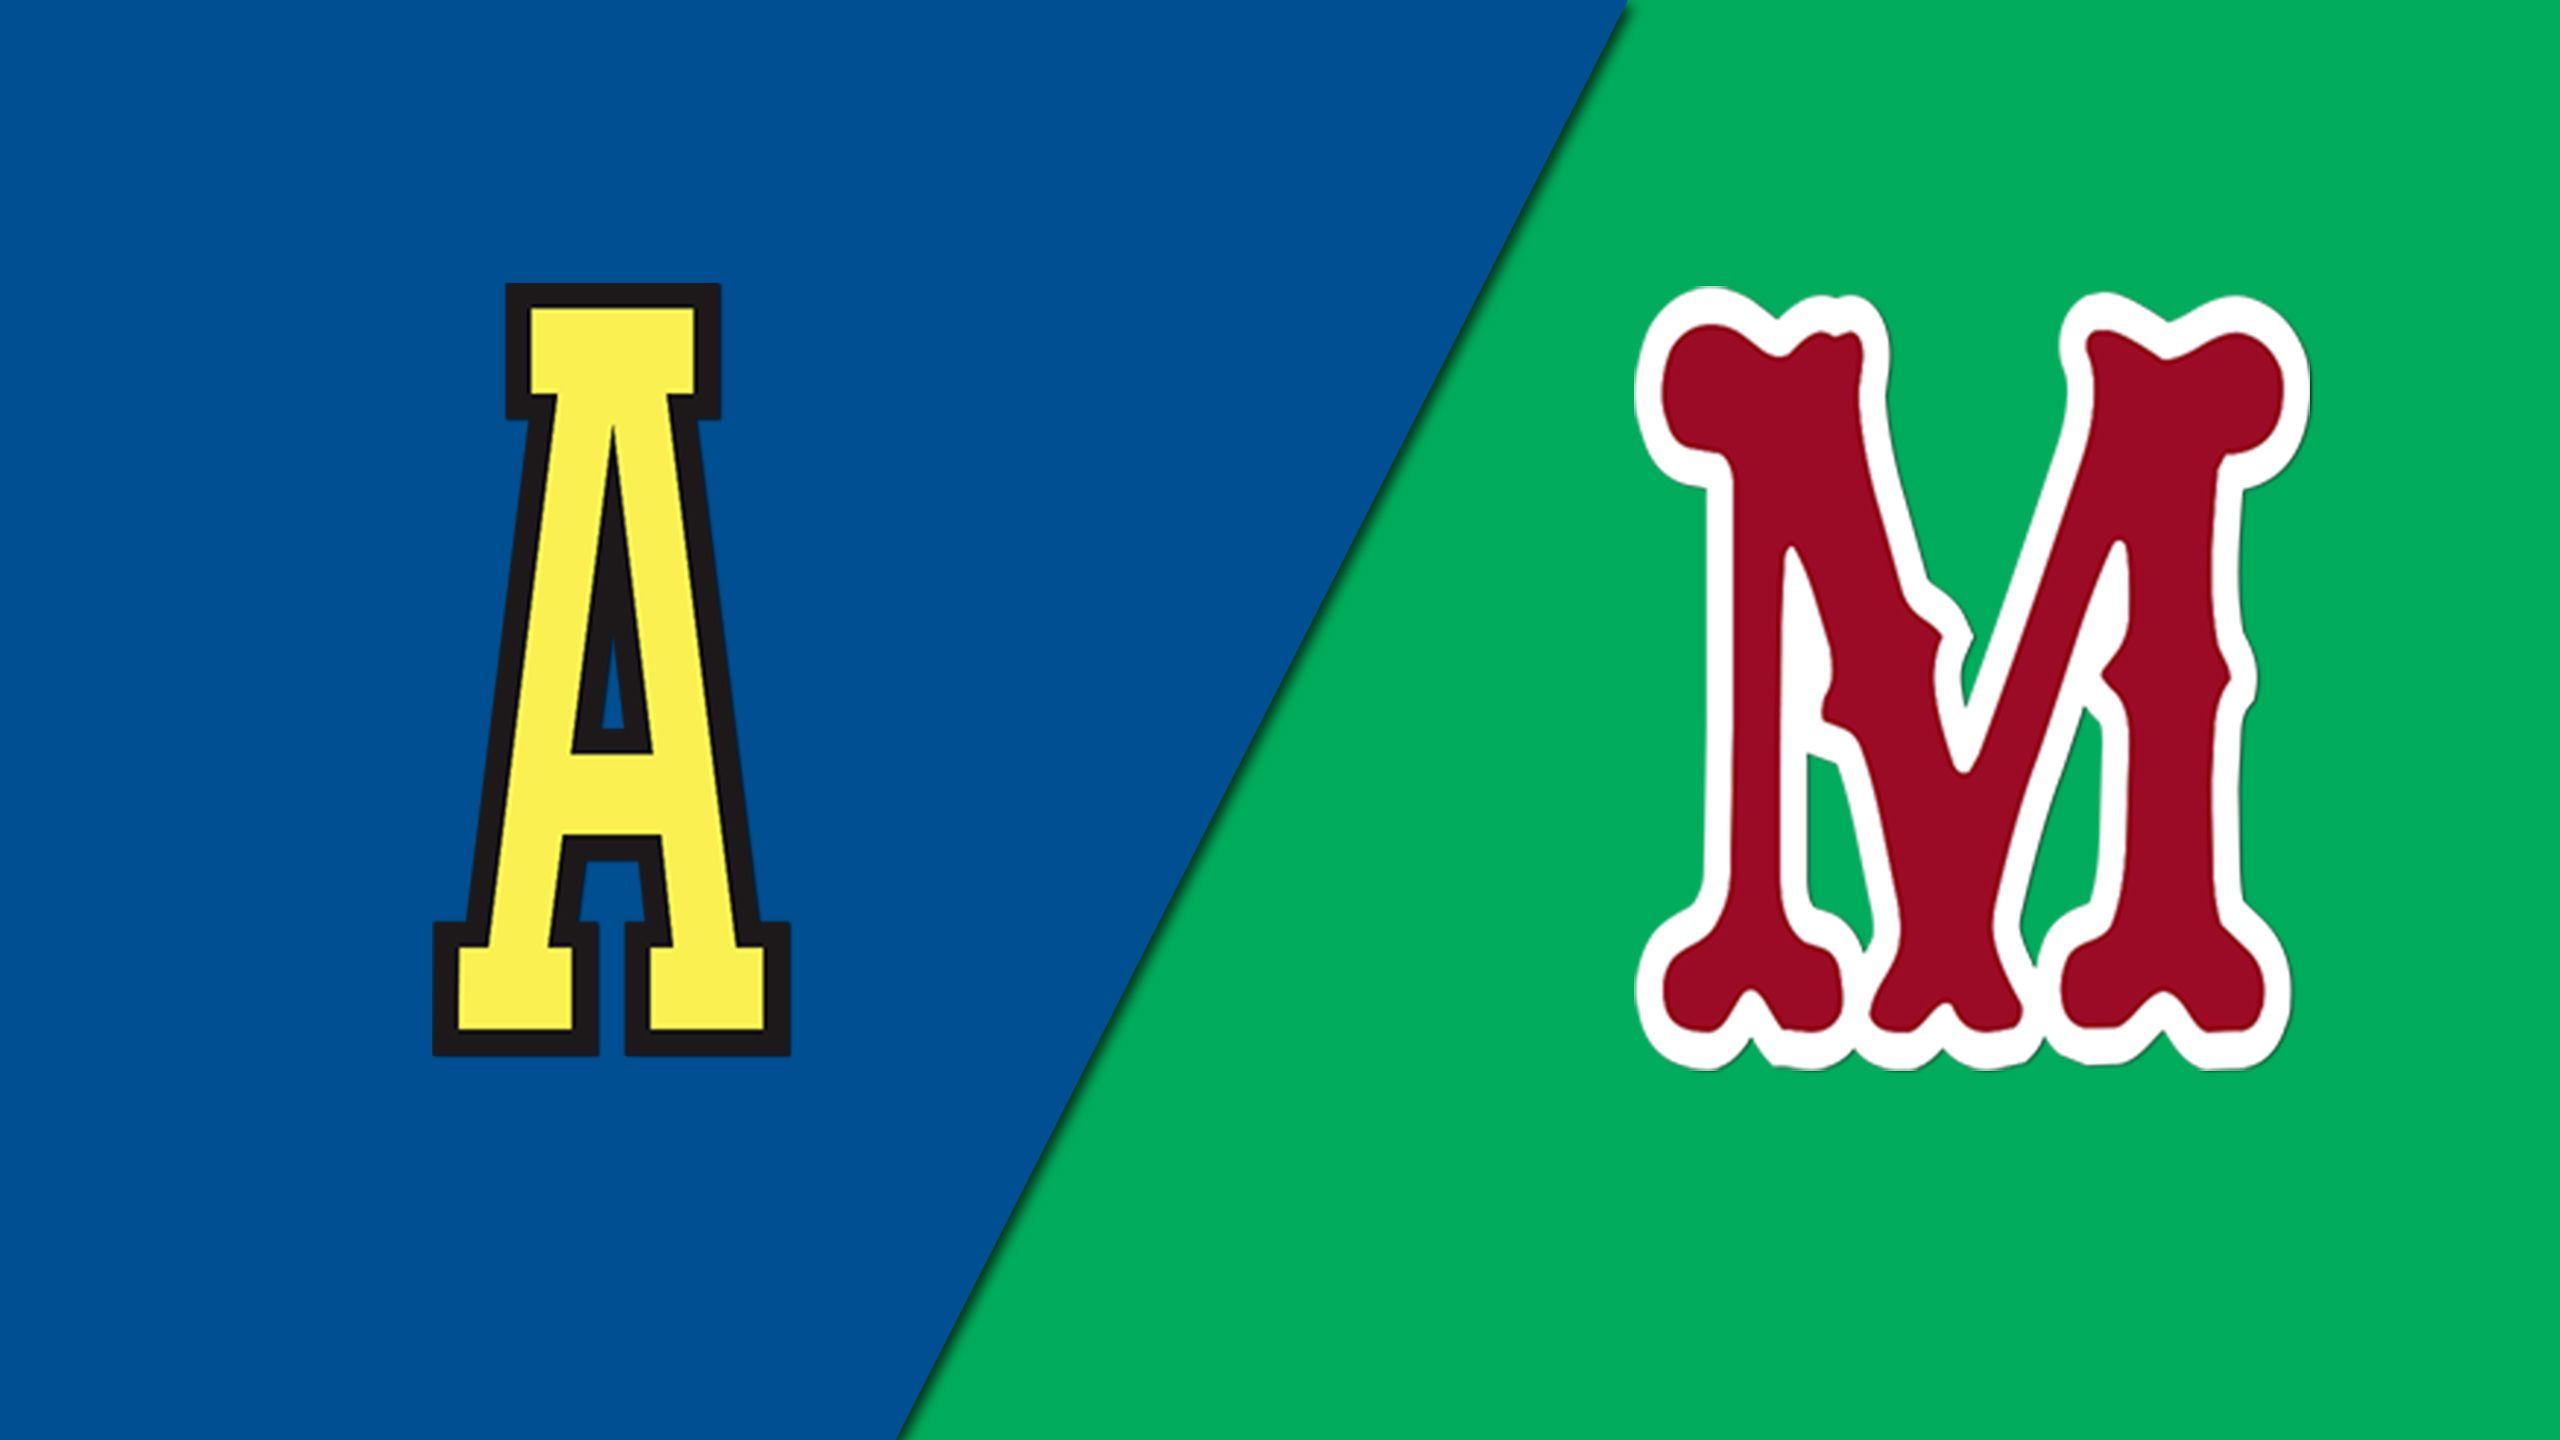 Queensland, Australia vs. Tamaulipas, Mexico (Little League World Series)